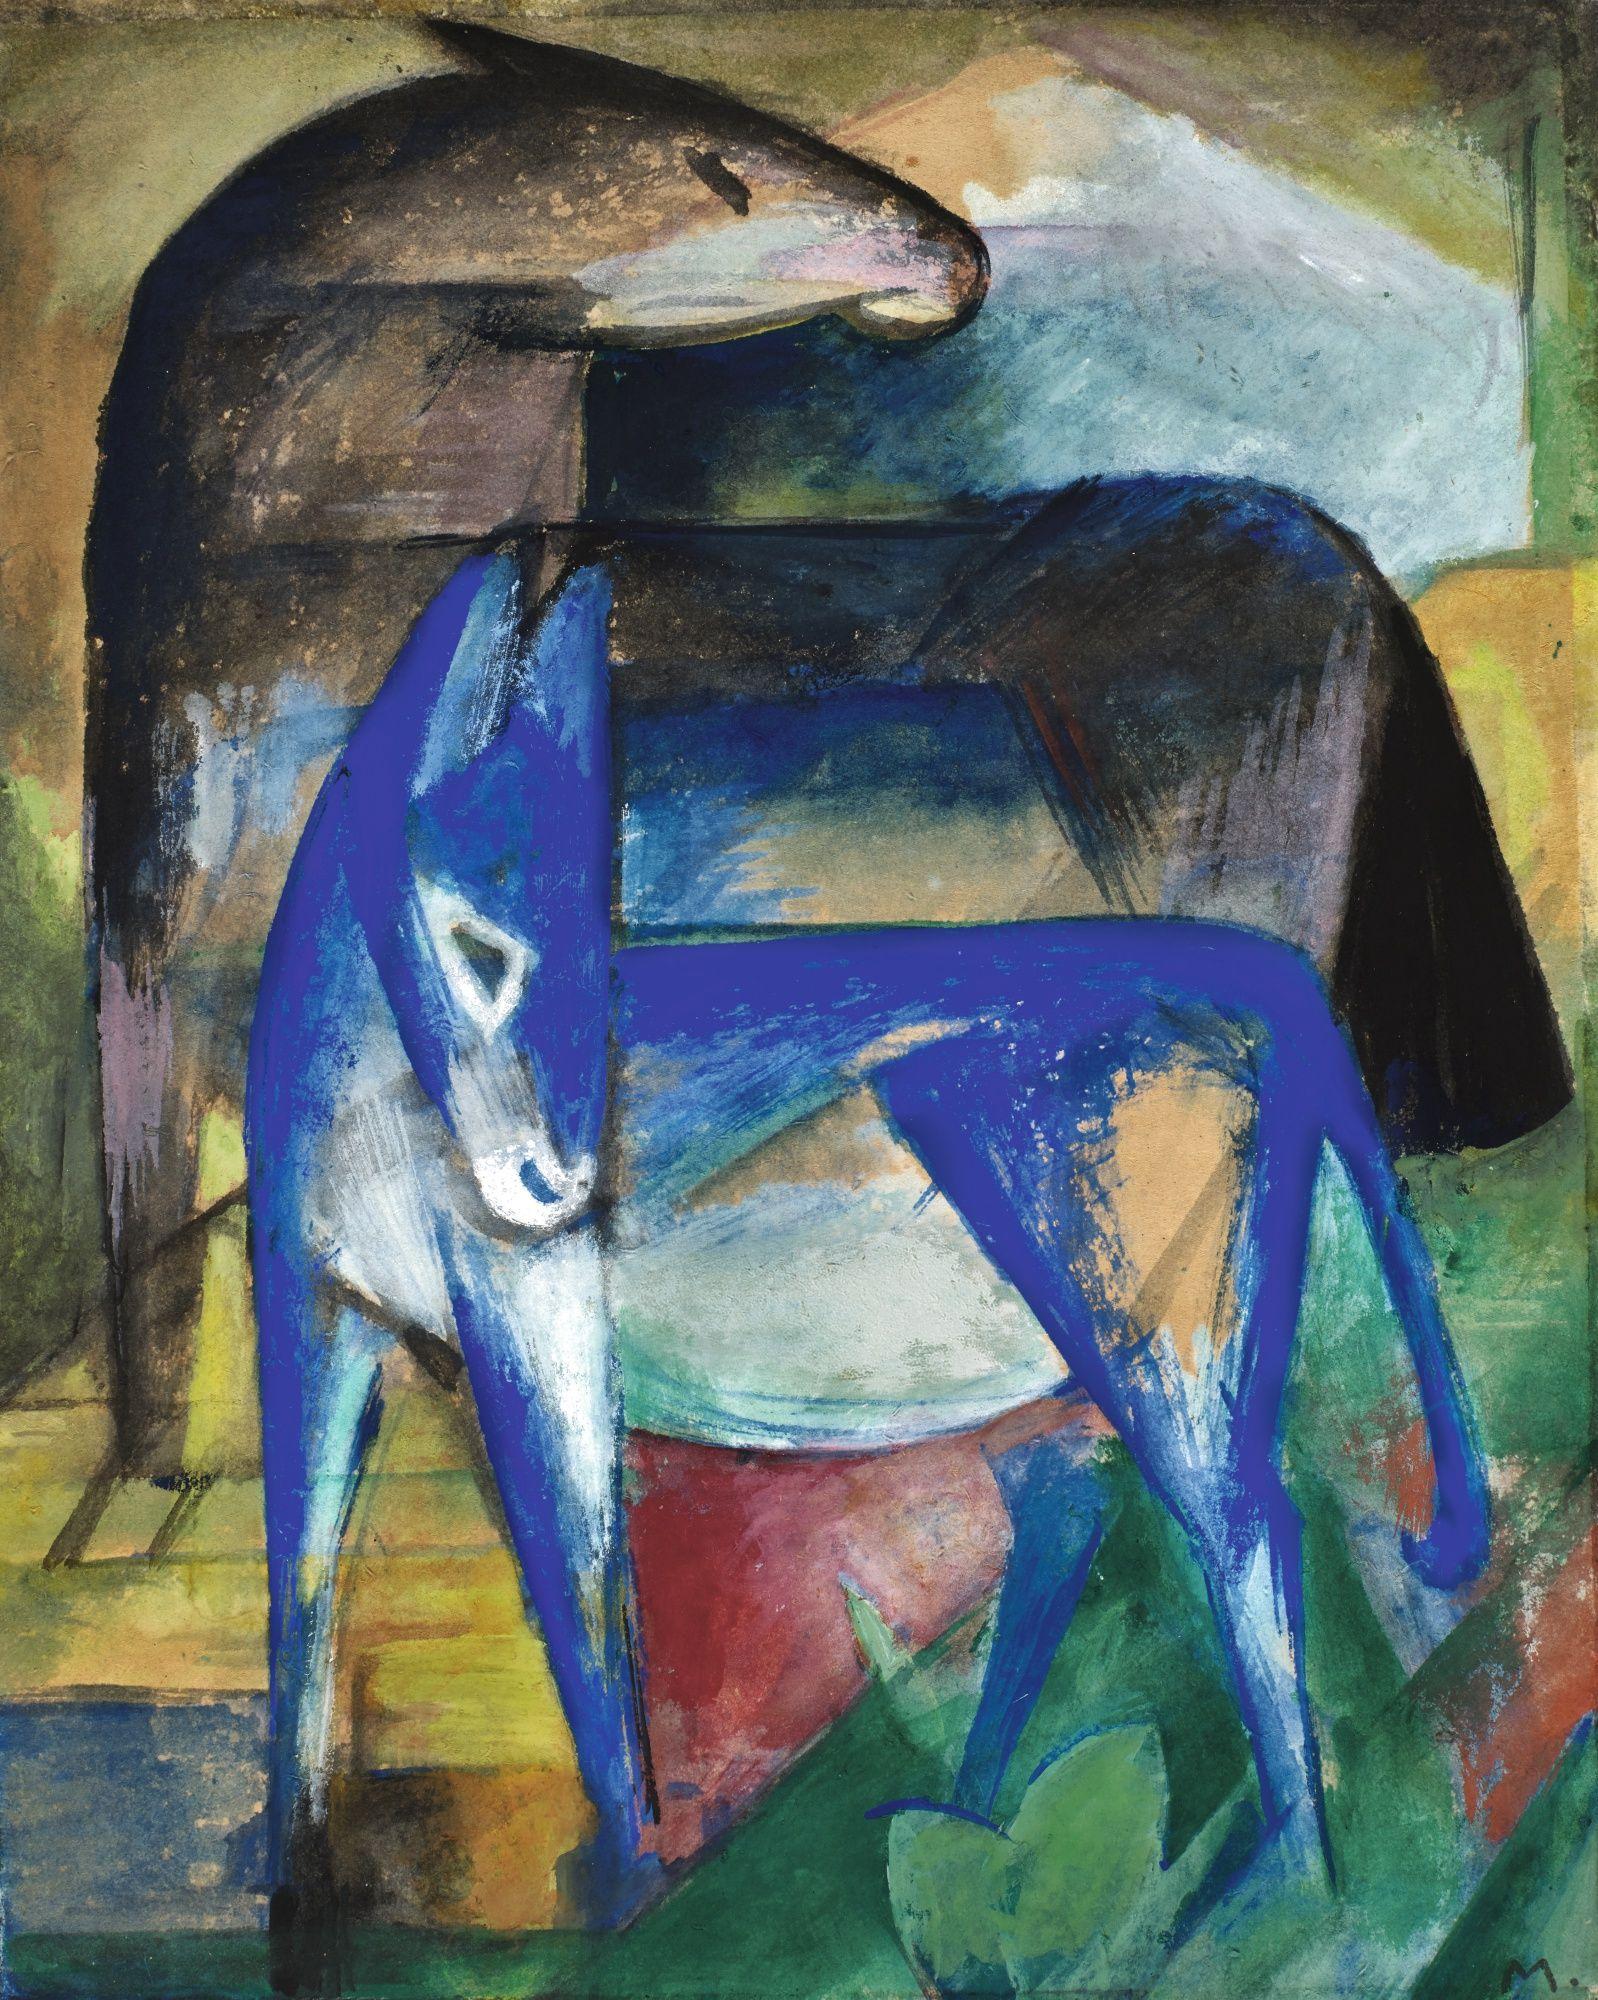 marc, franz zwei blaue esel (pfe     animals     sotheby's l20002lotbfrg7en